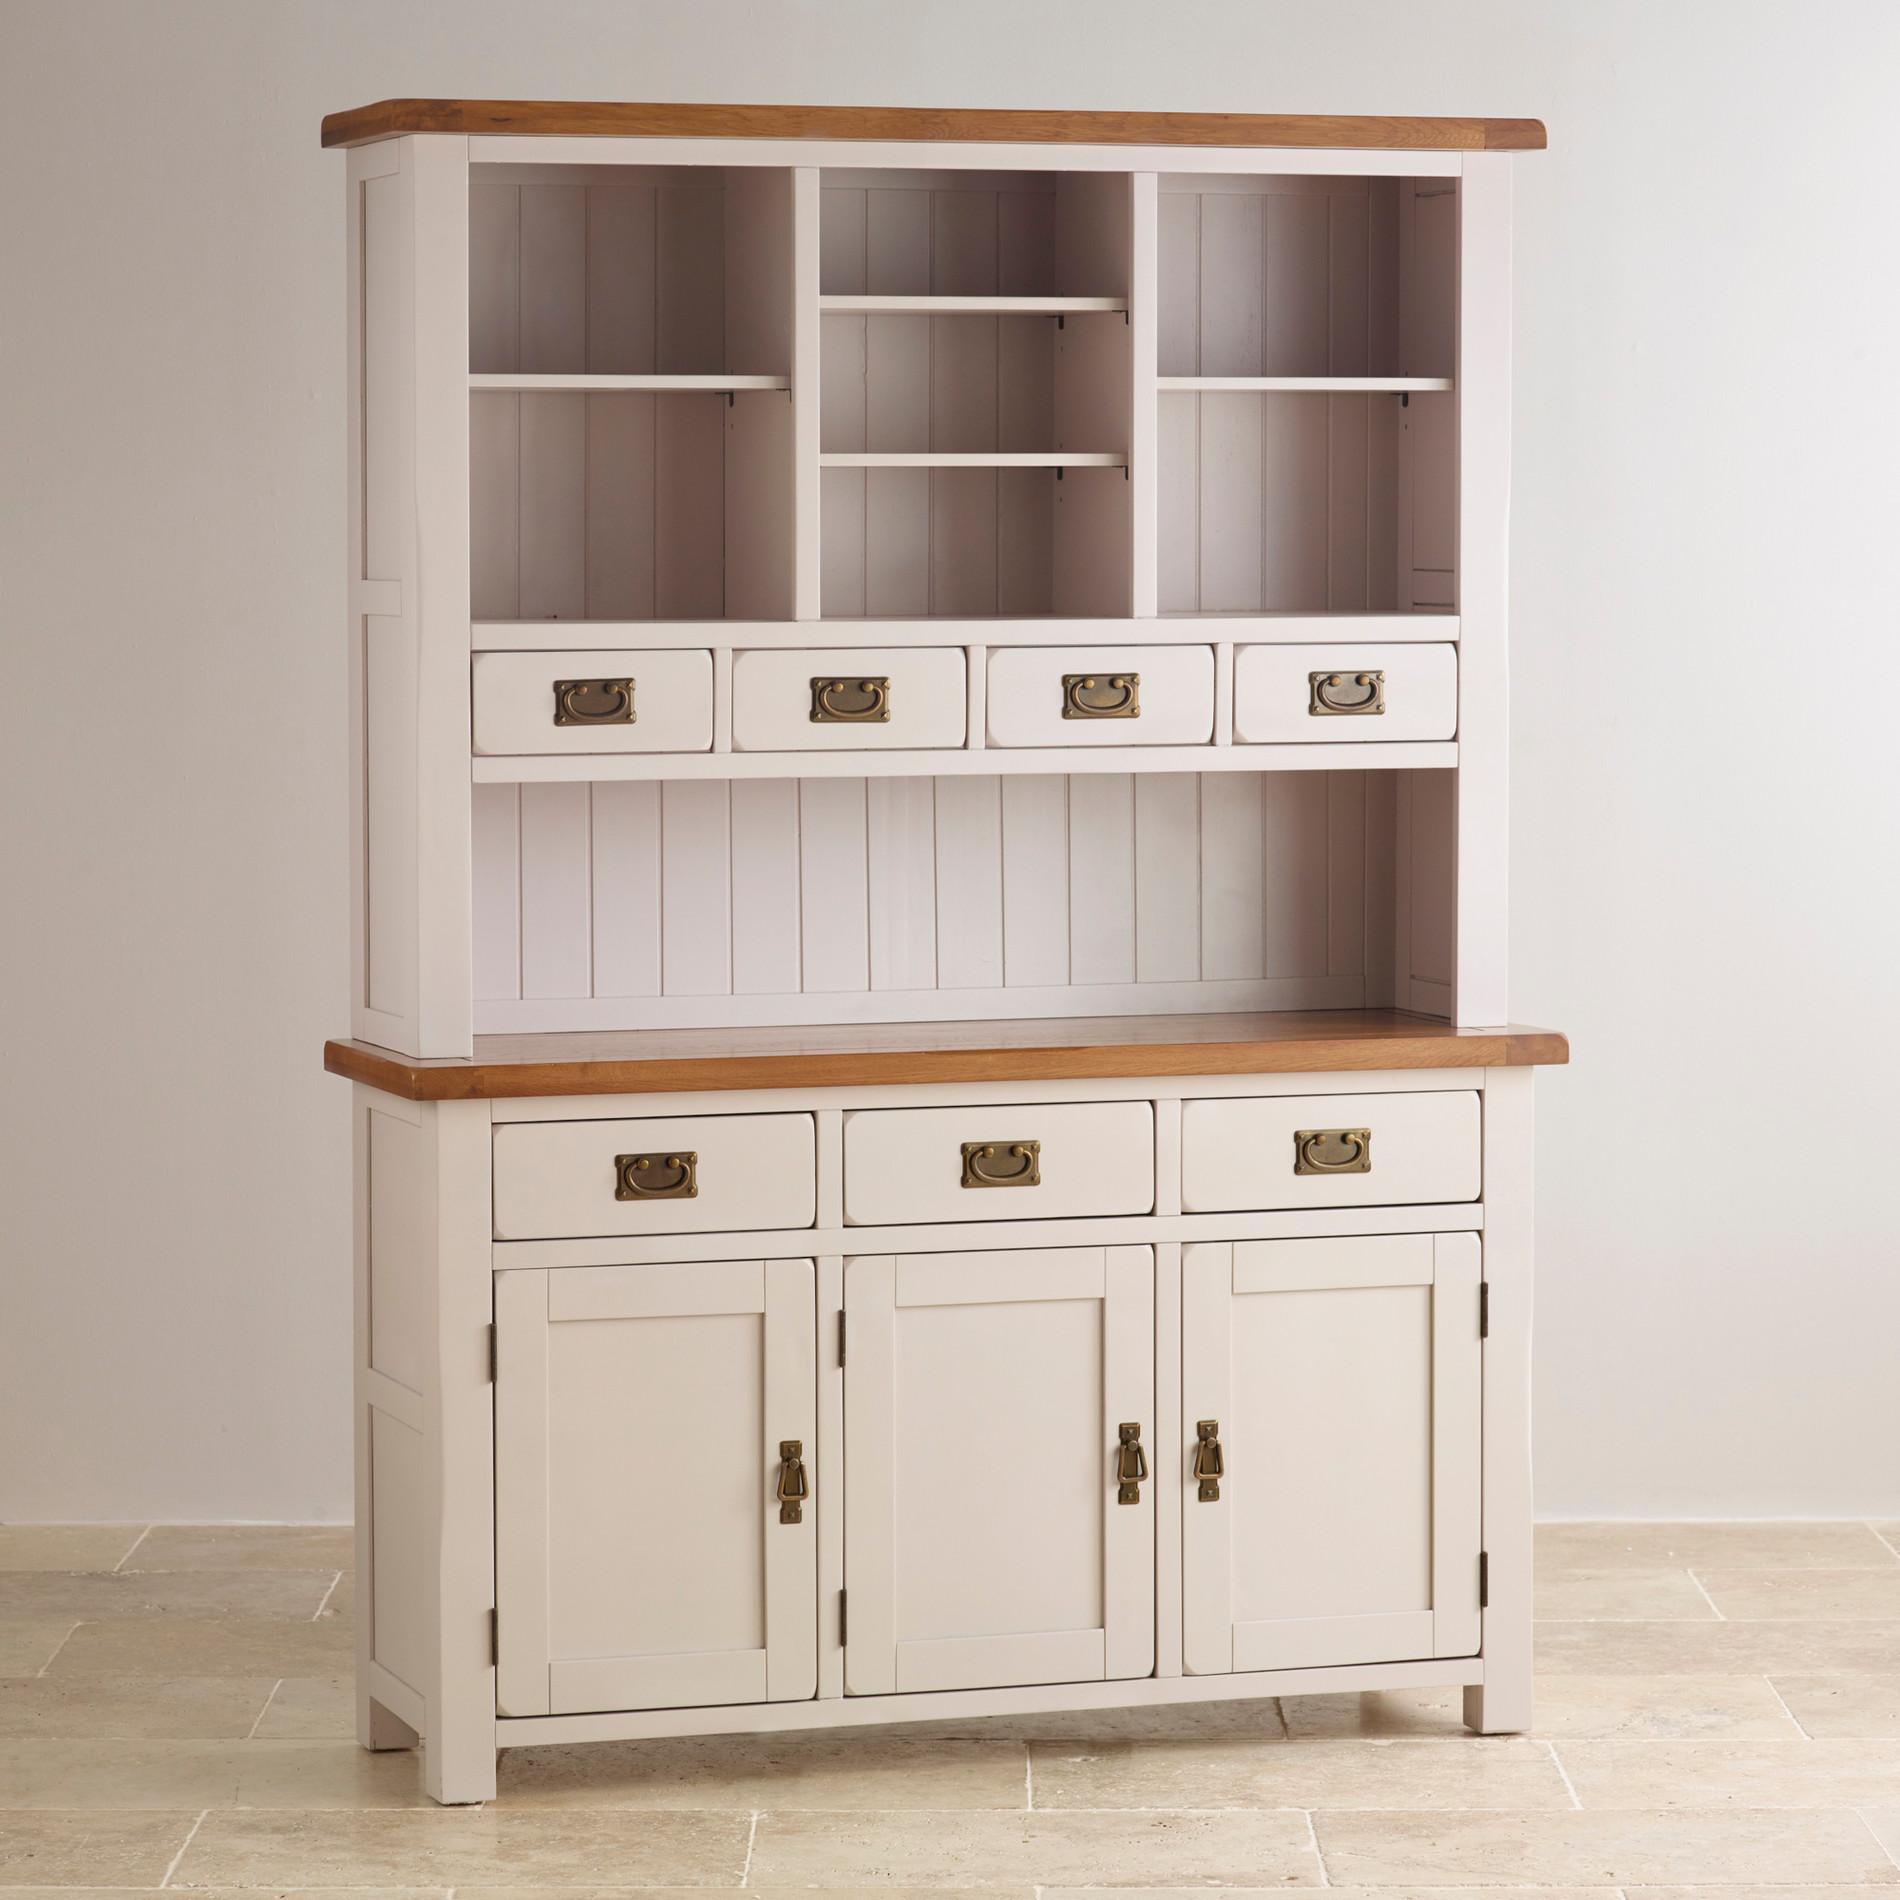 Vaisselier En Chene: Kemble Painted Large Dresser In Rustic Solid Oak